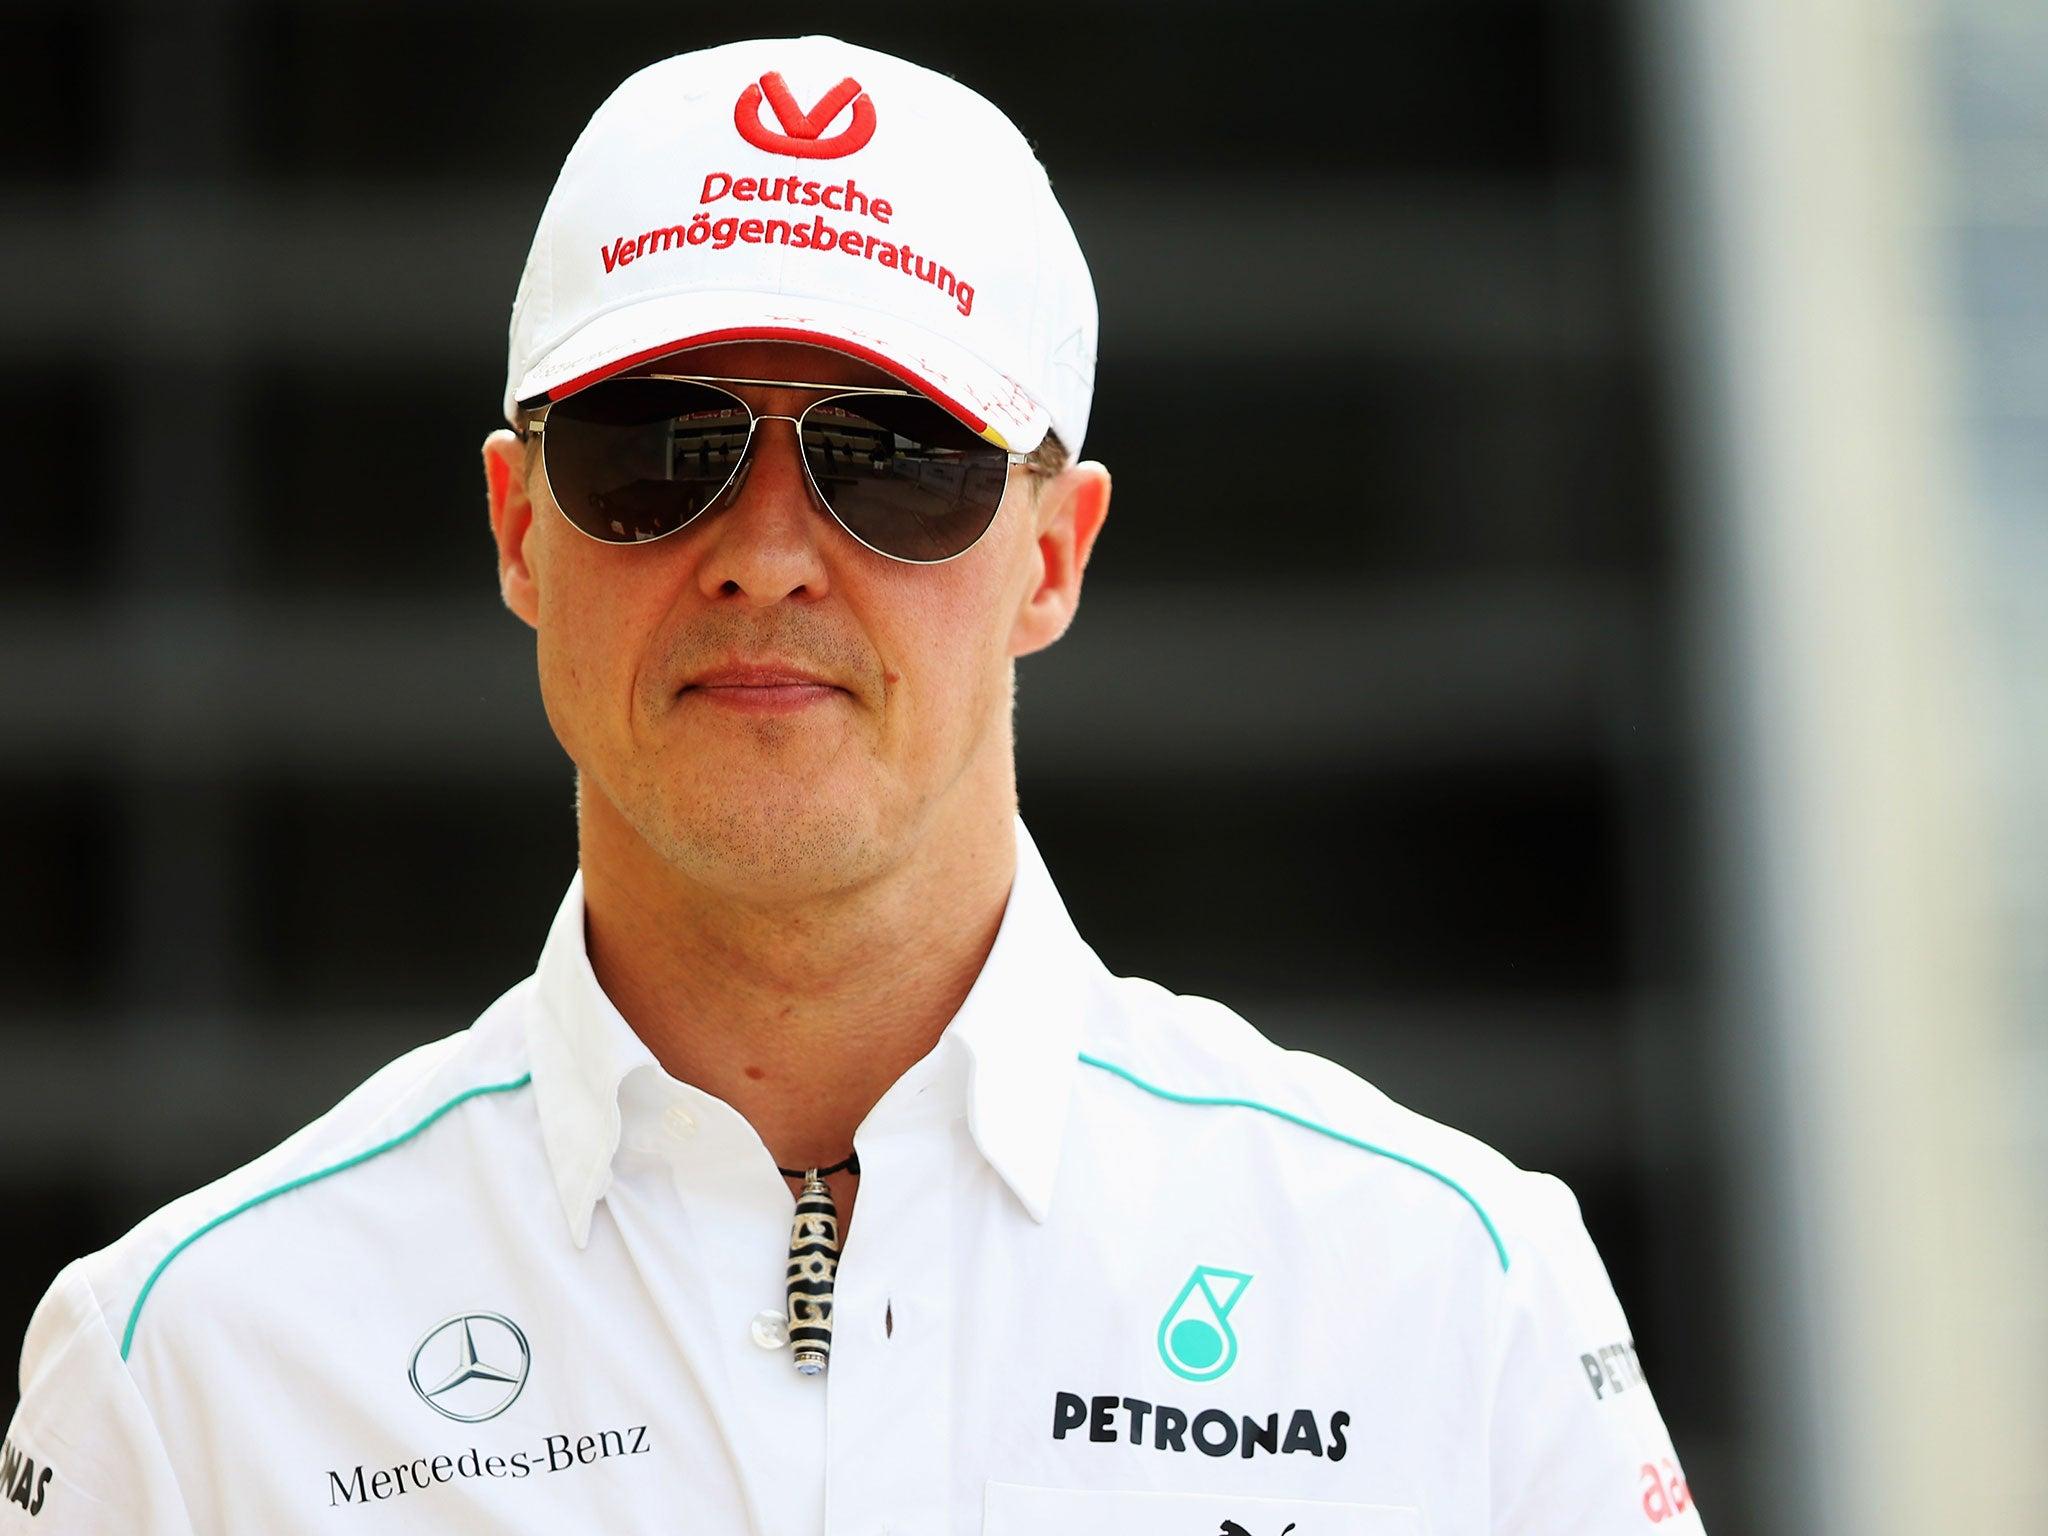 Michael schumacher latest news about formula one driver not good claims former ferrari boss the independent